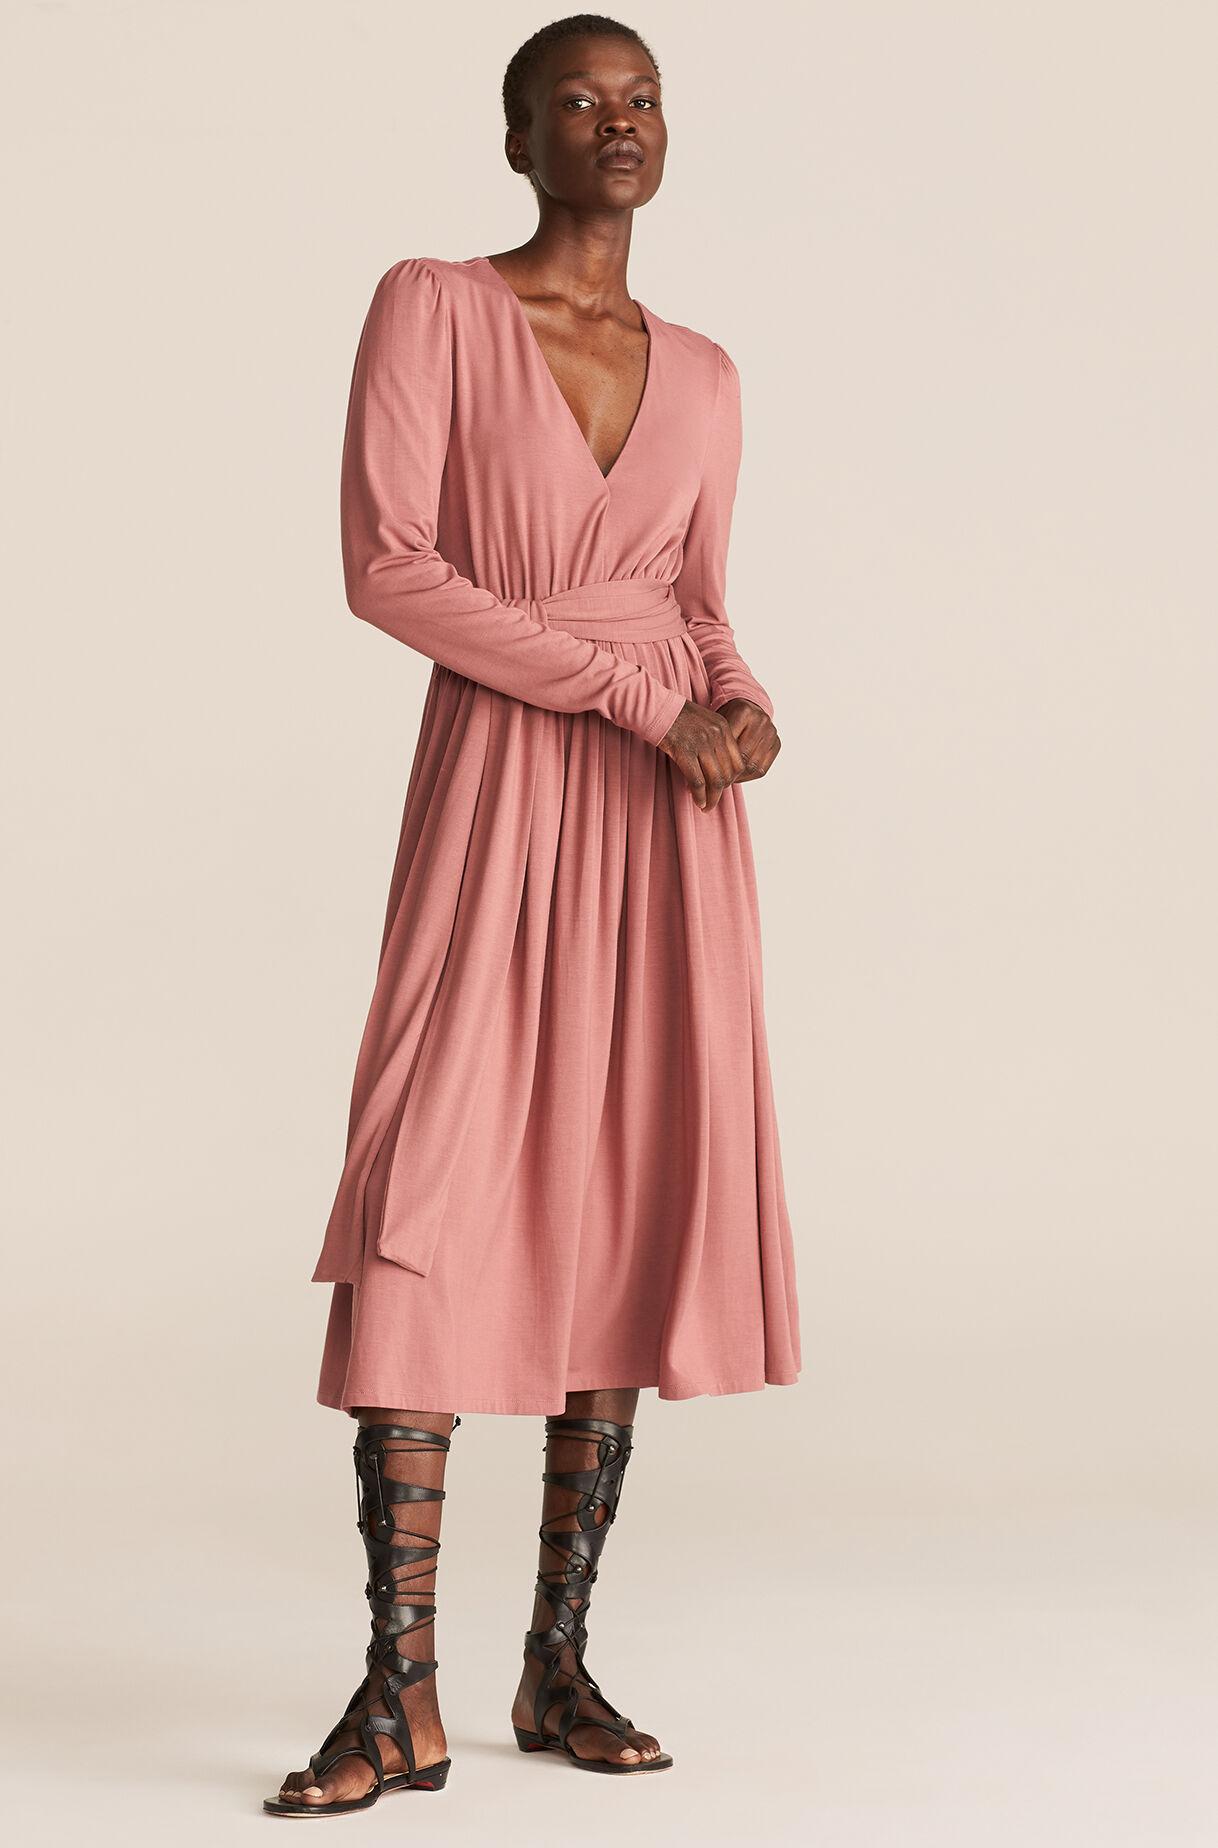 pink v-neck modal dress for spring wedding